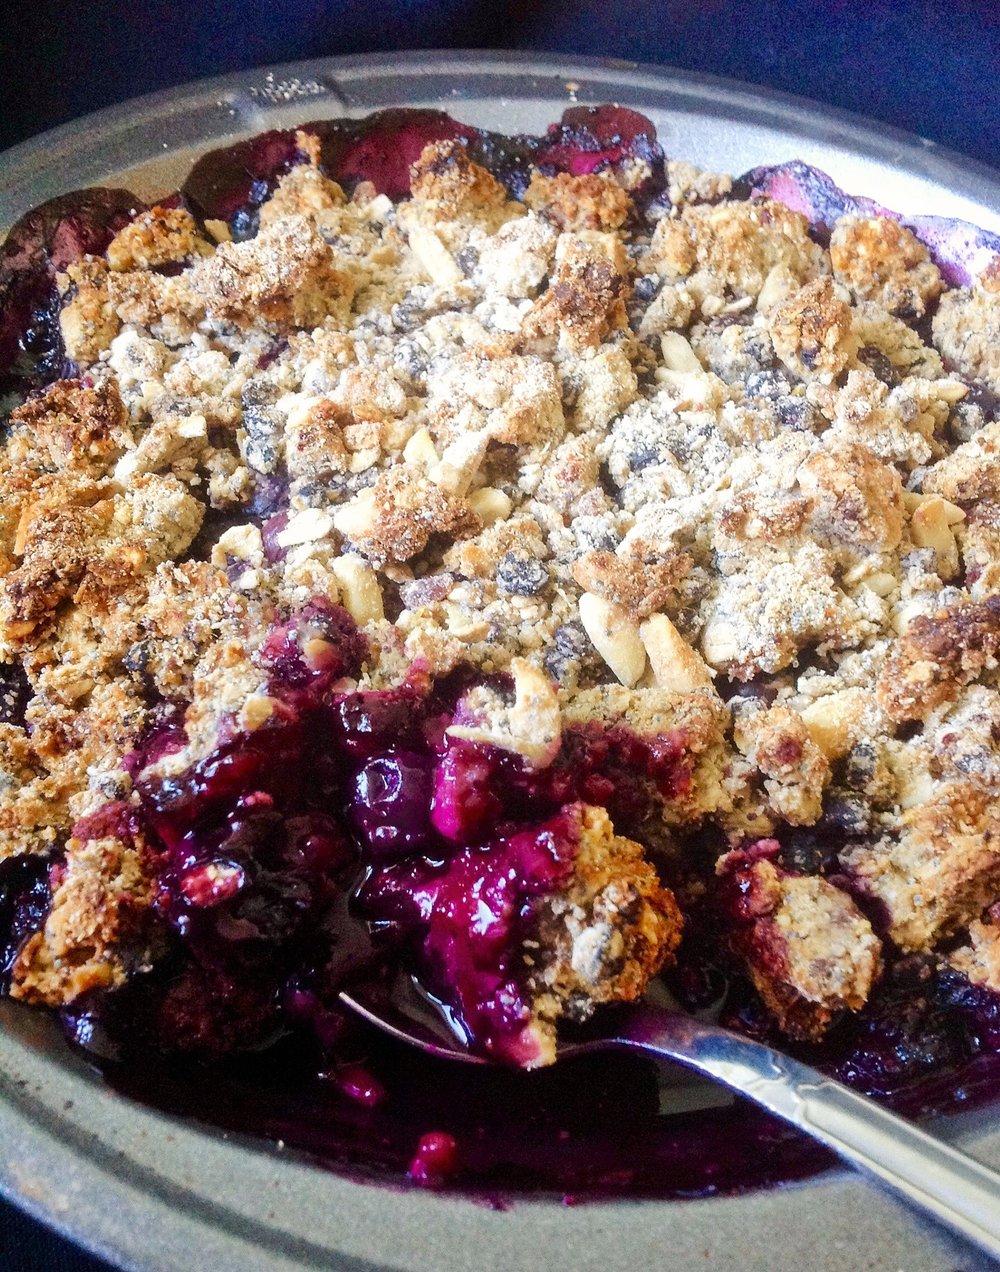 Blueberry Oat Crisp - Healthy, Gluten-Free, Whole Grain, Oil-Free, No Refined Sugar, Plant-Based, Vegan